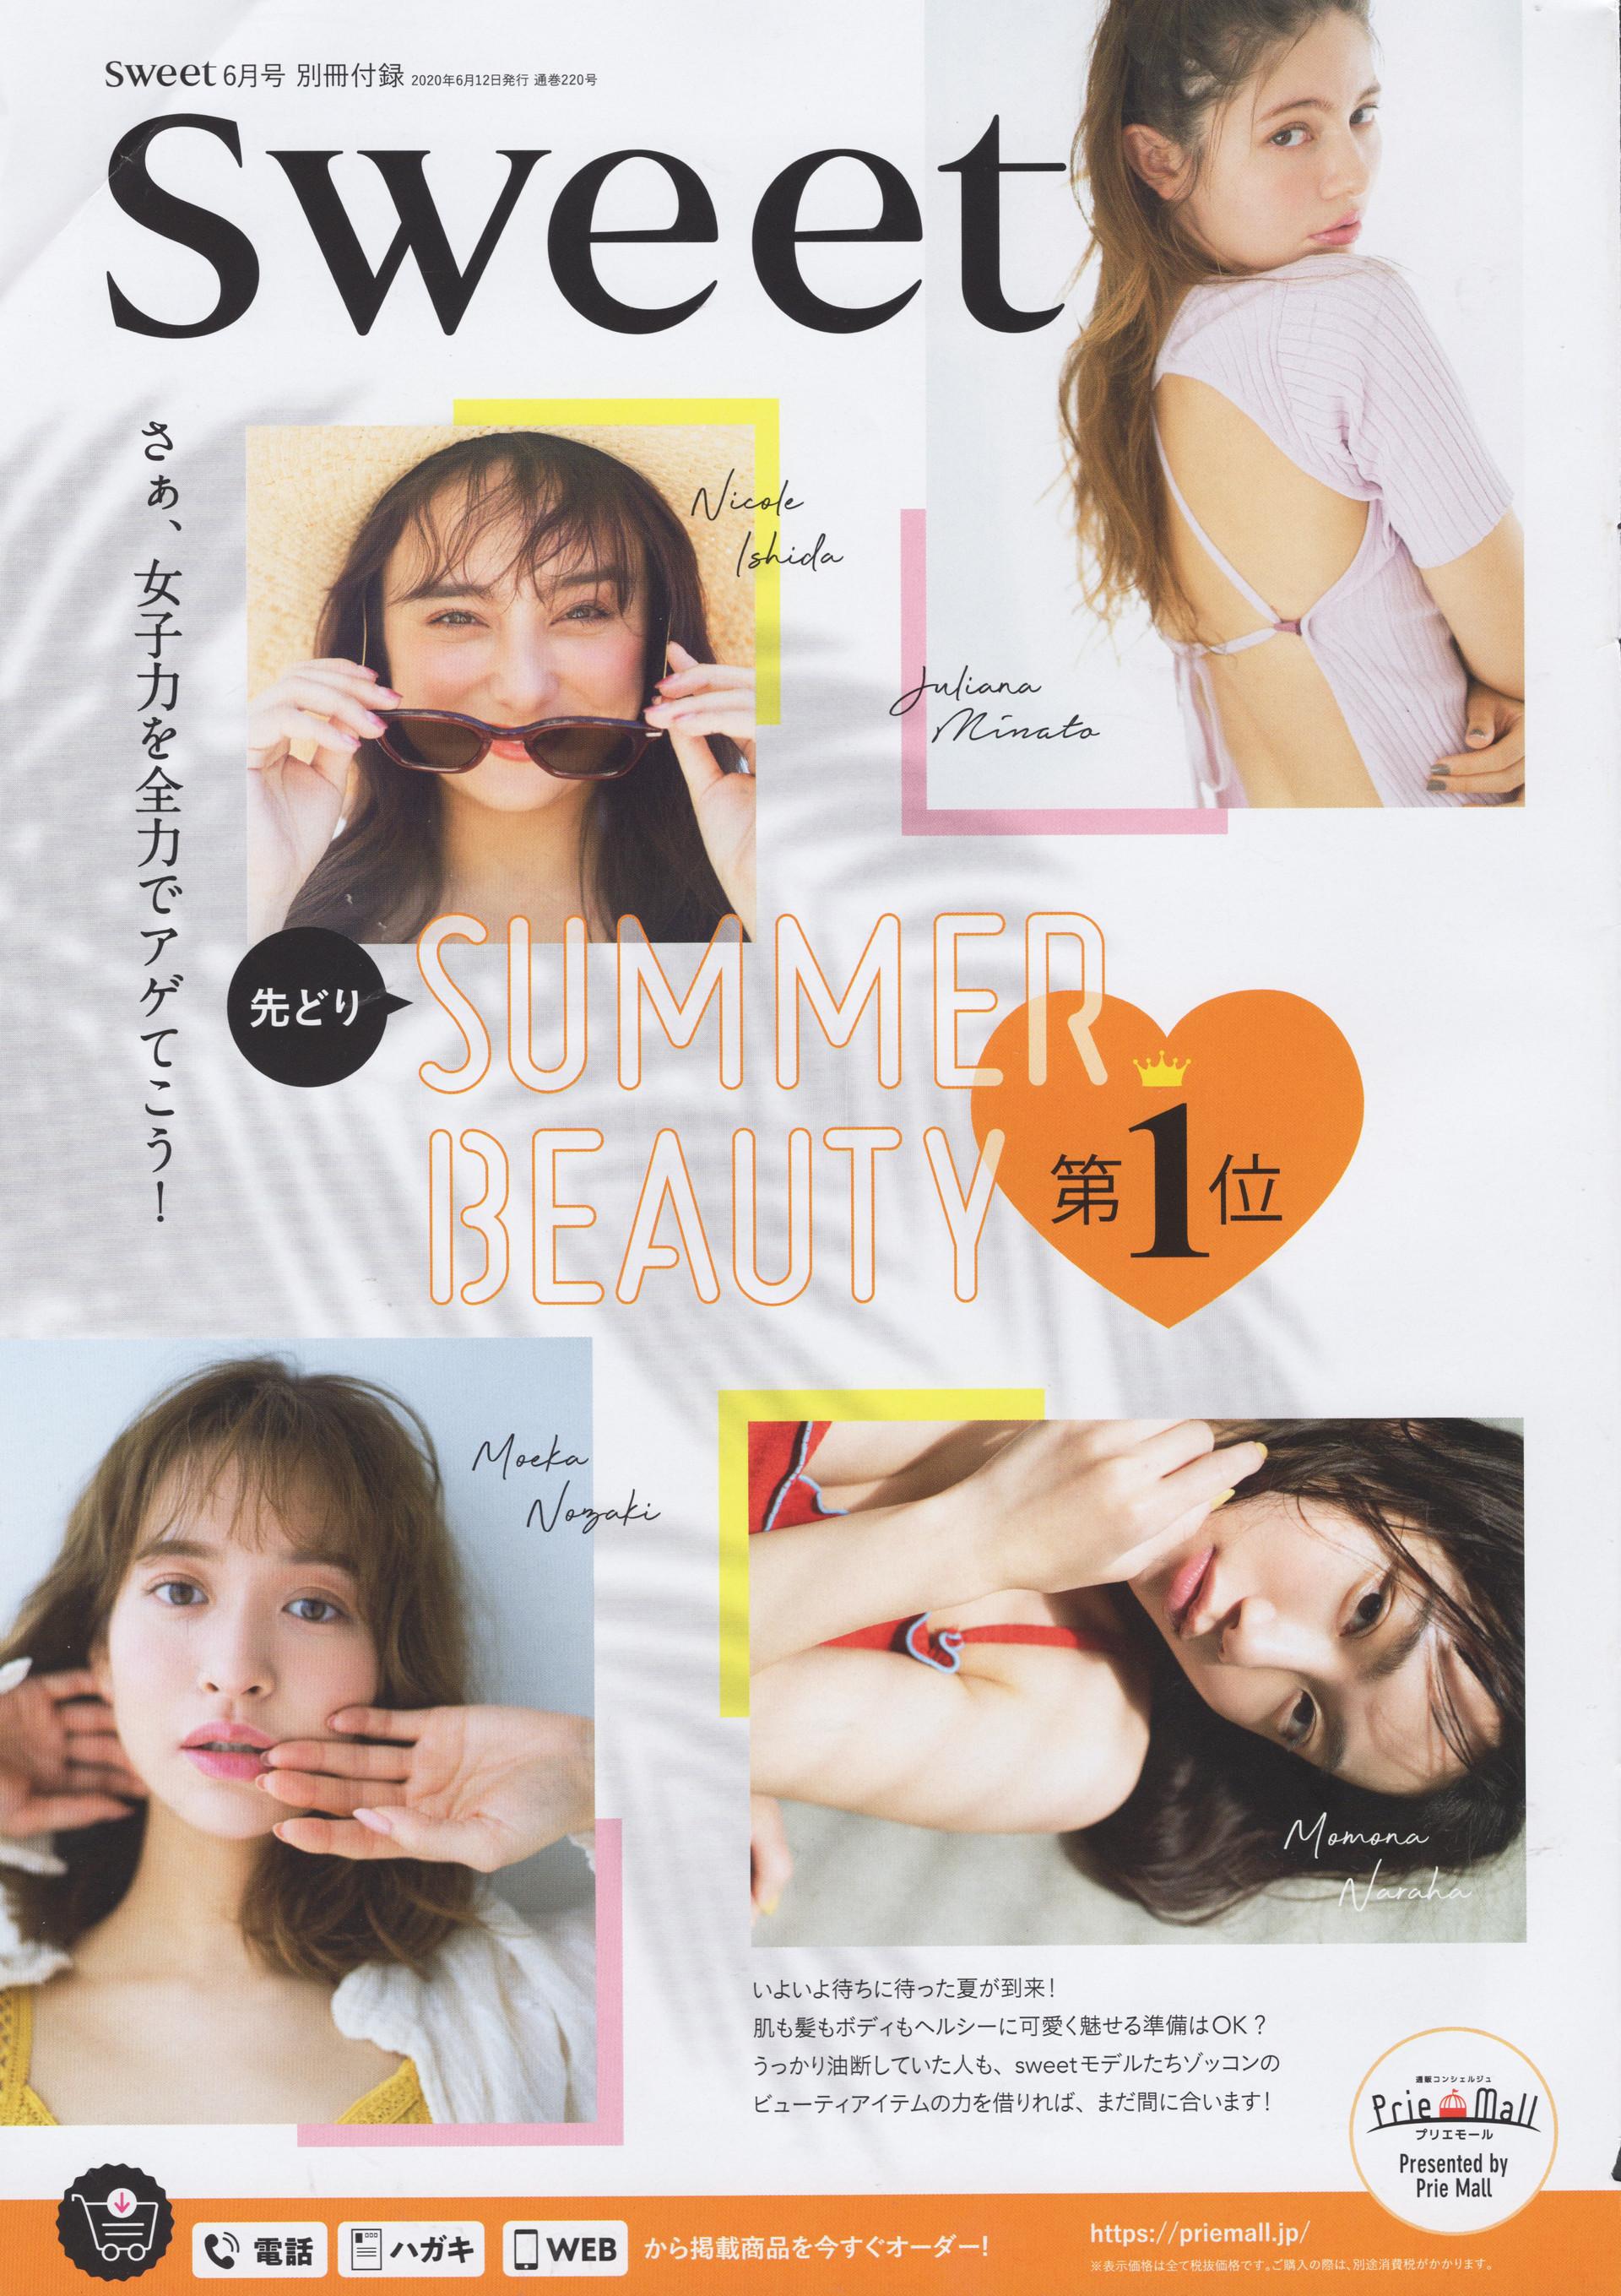 Sweet magazine - 6月号